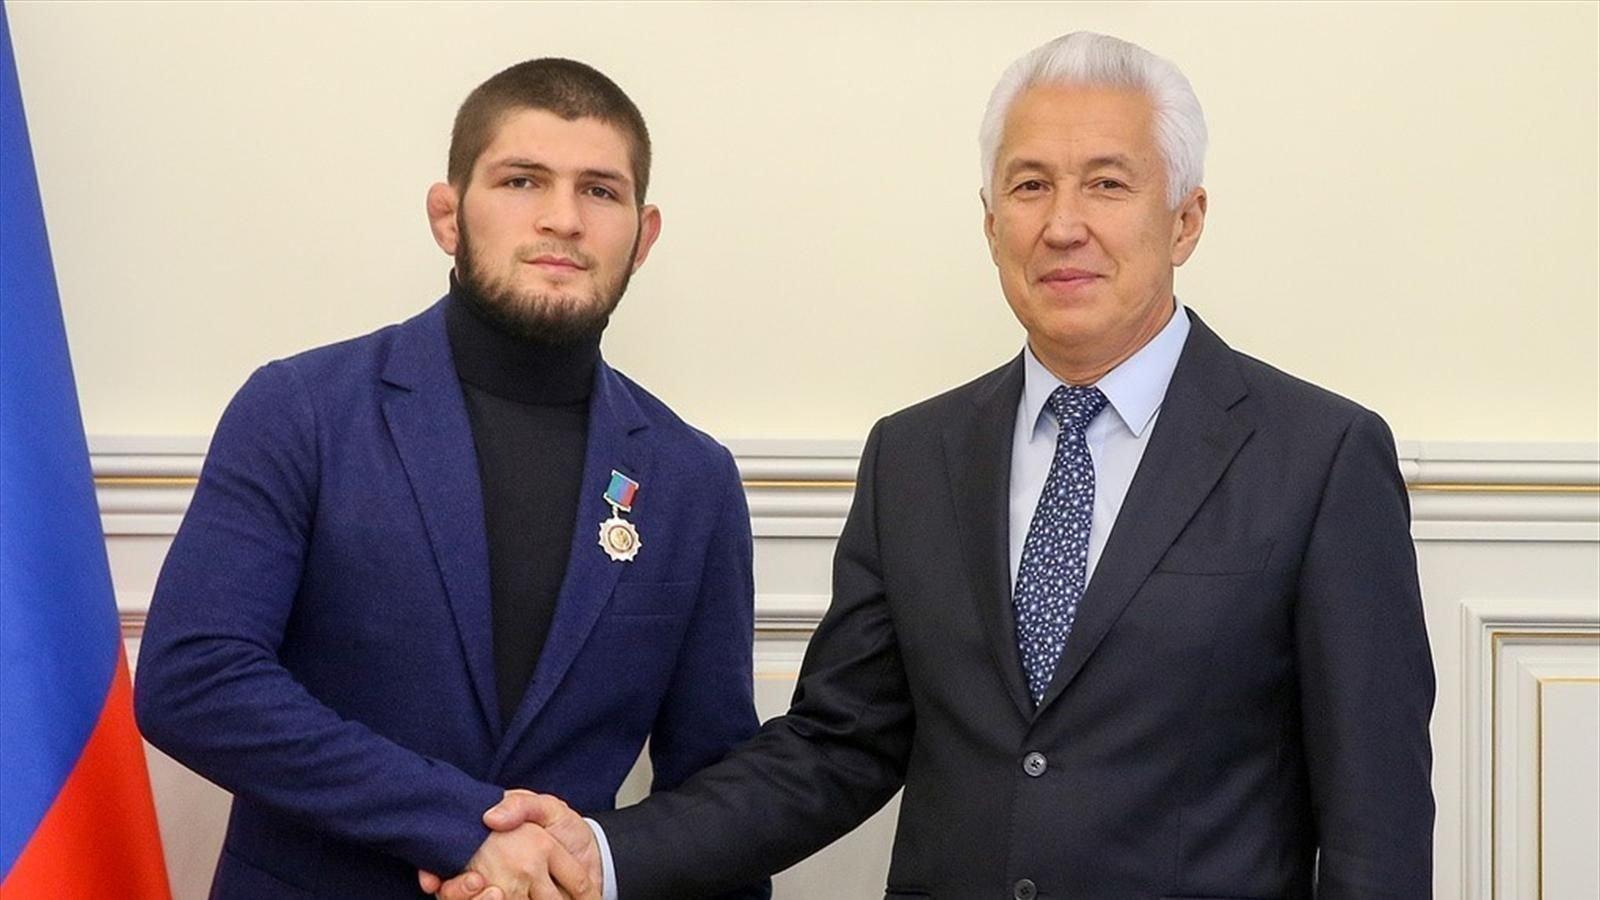 Награждение Хабиба Нурмагомедова